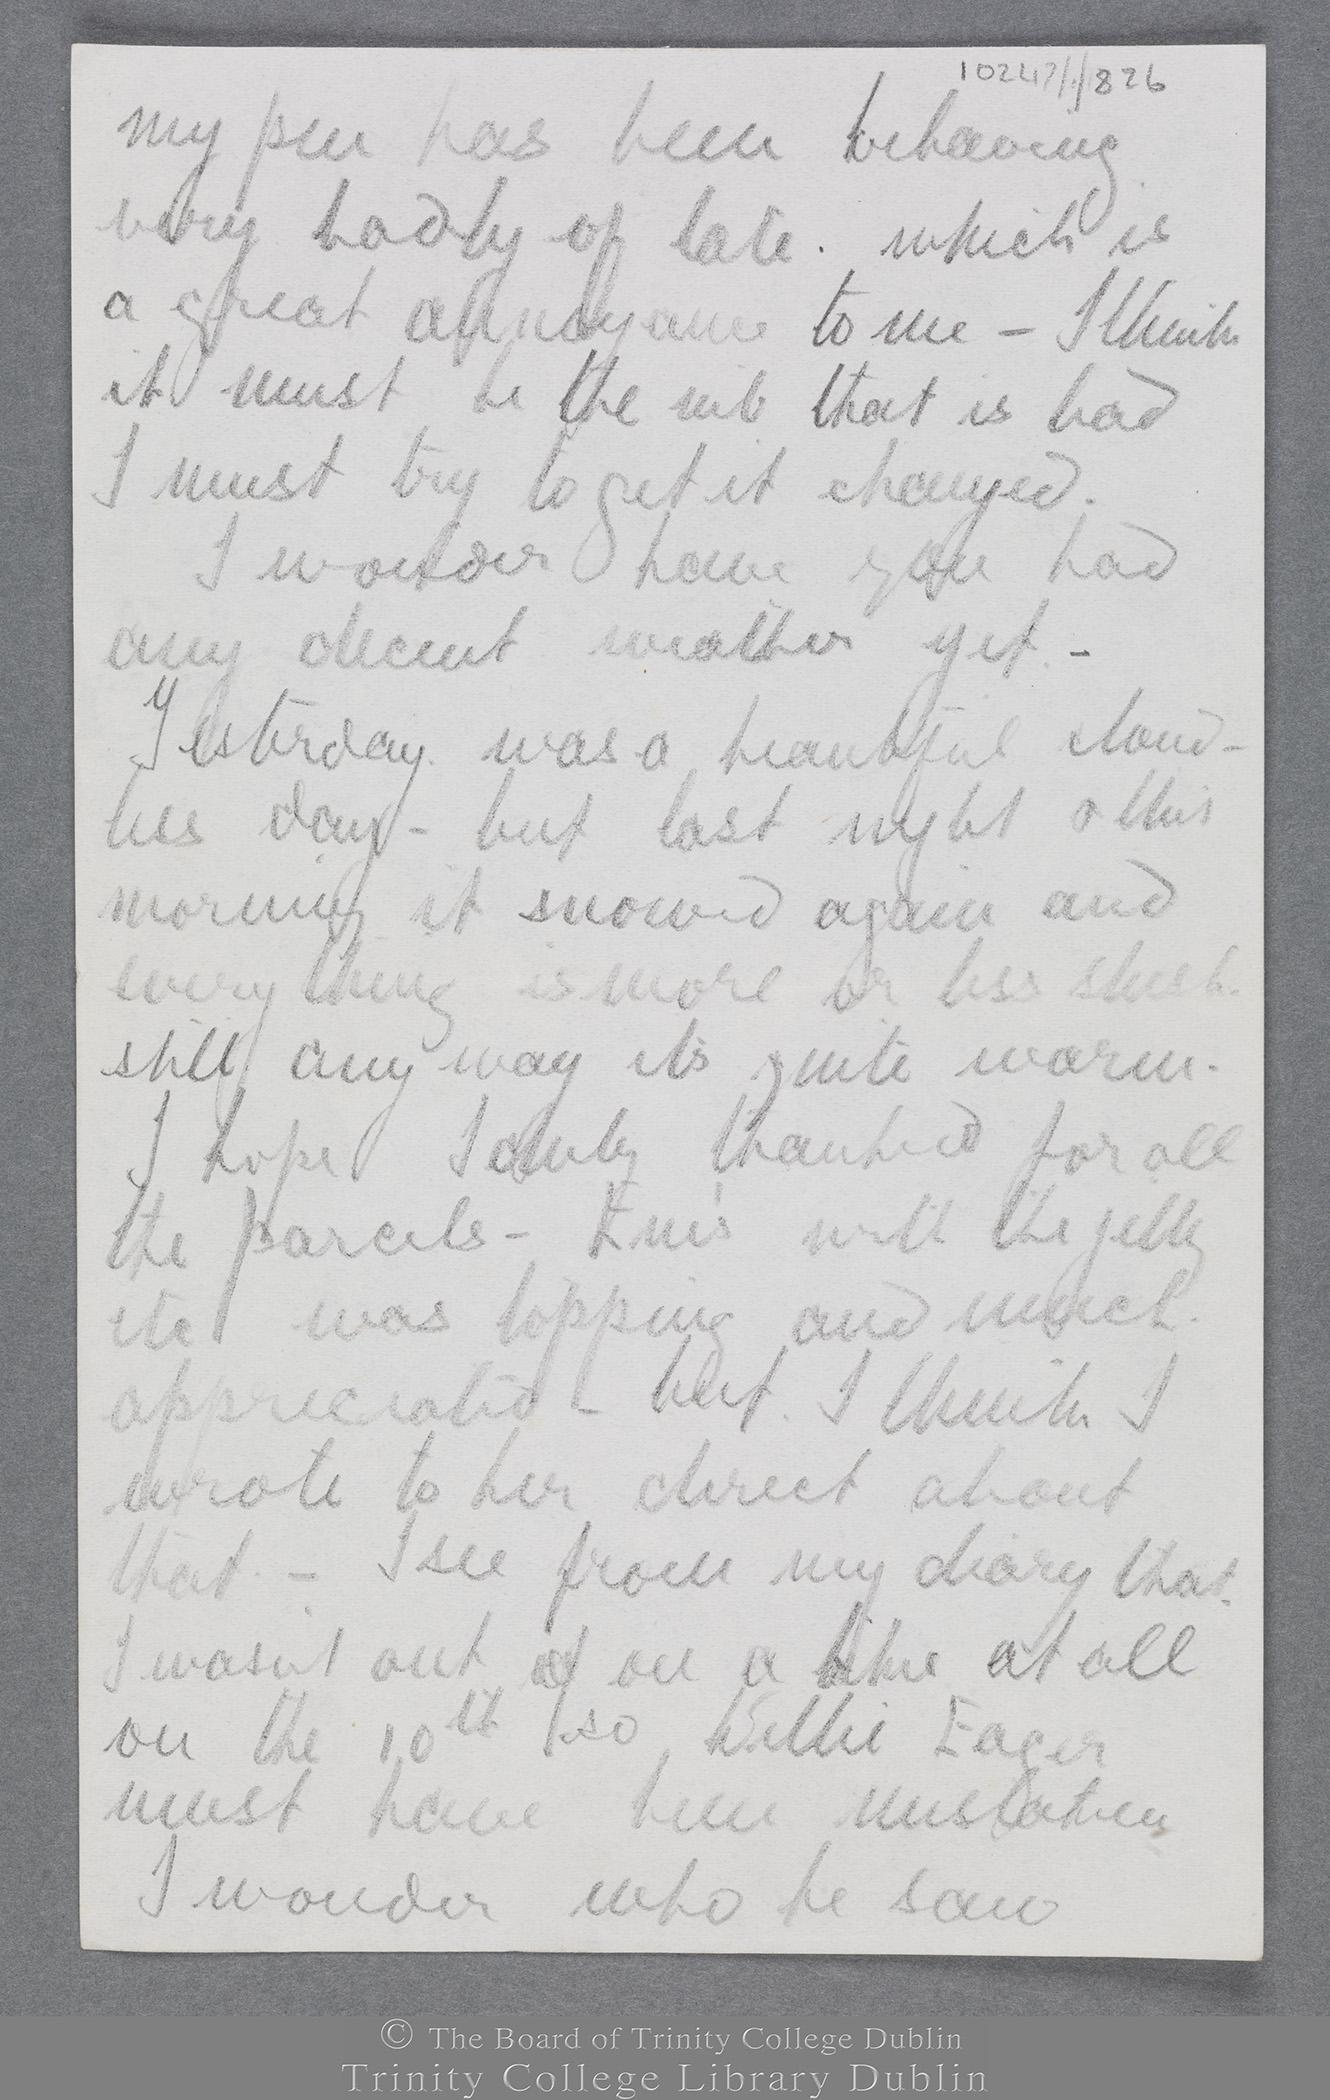 TCD MS 10247/1/826 folio 2 recto